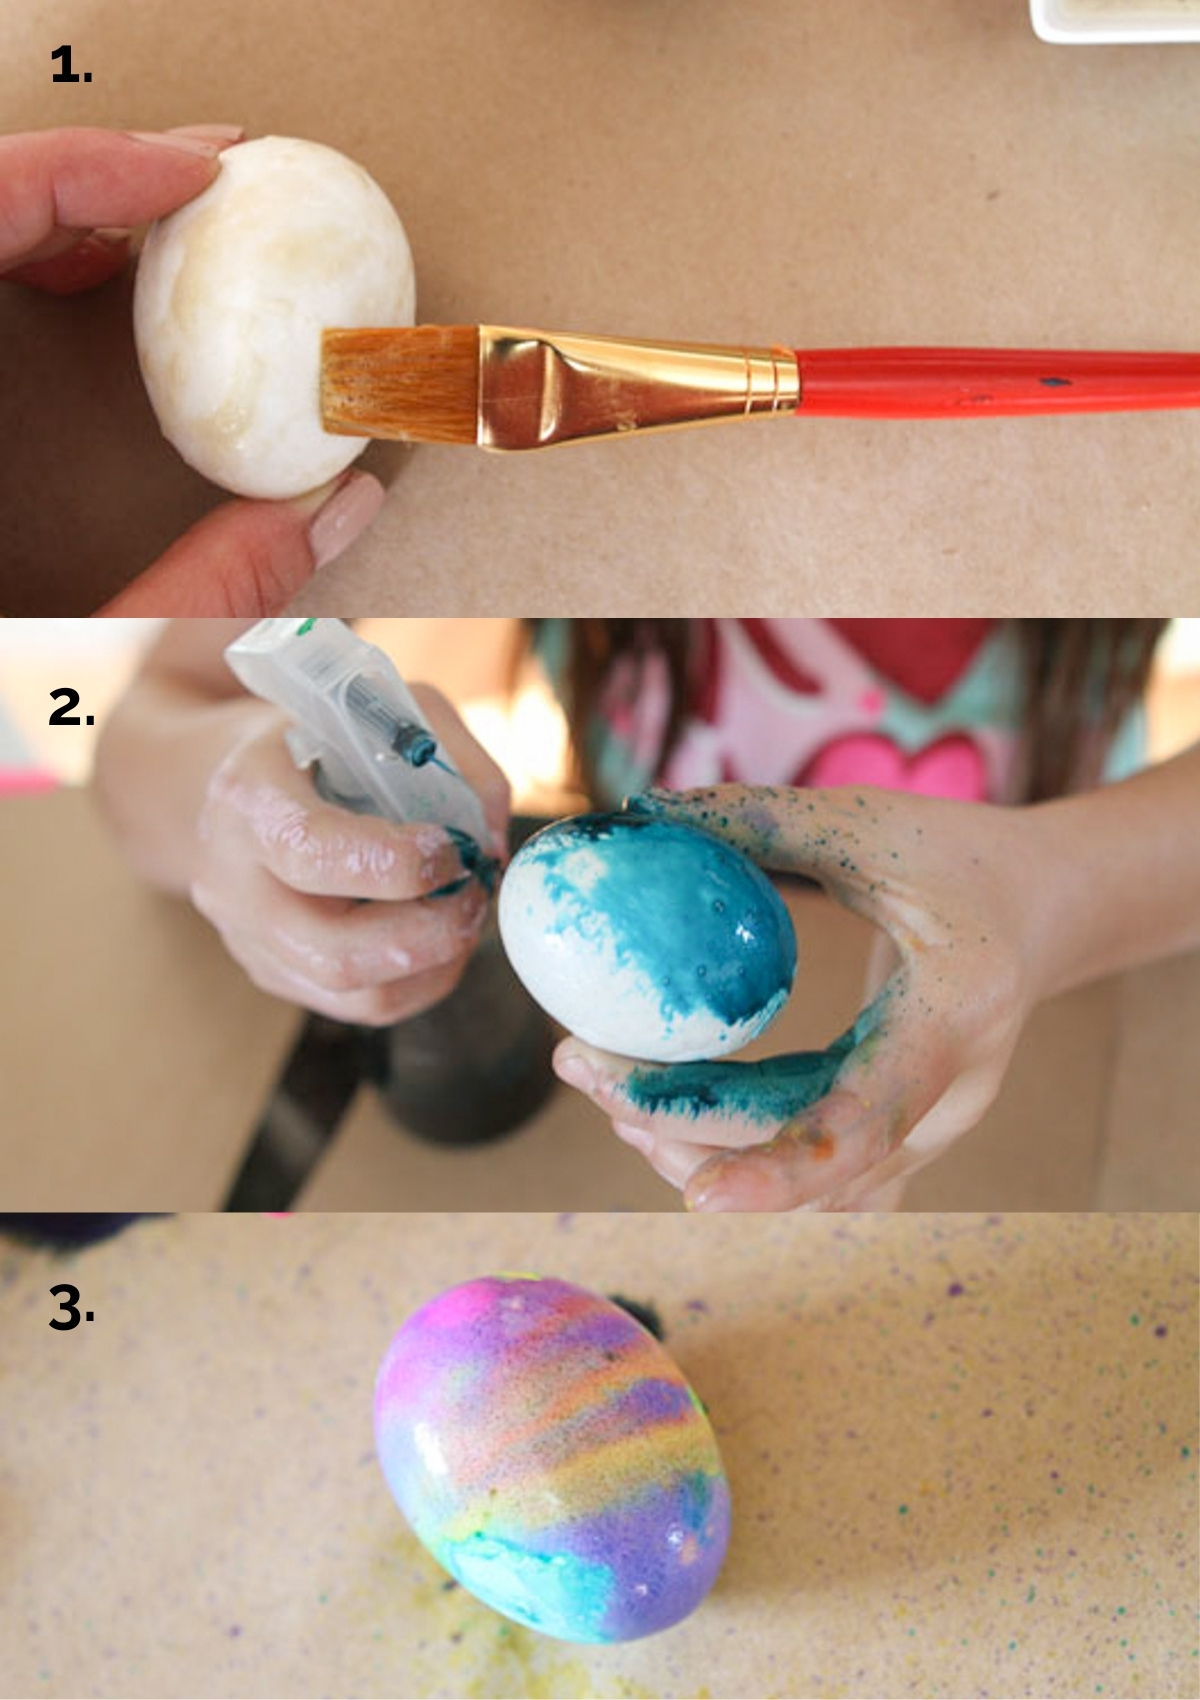 applying watercolors to hardboiled eggs to create watercolor Easter eggs